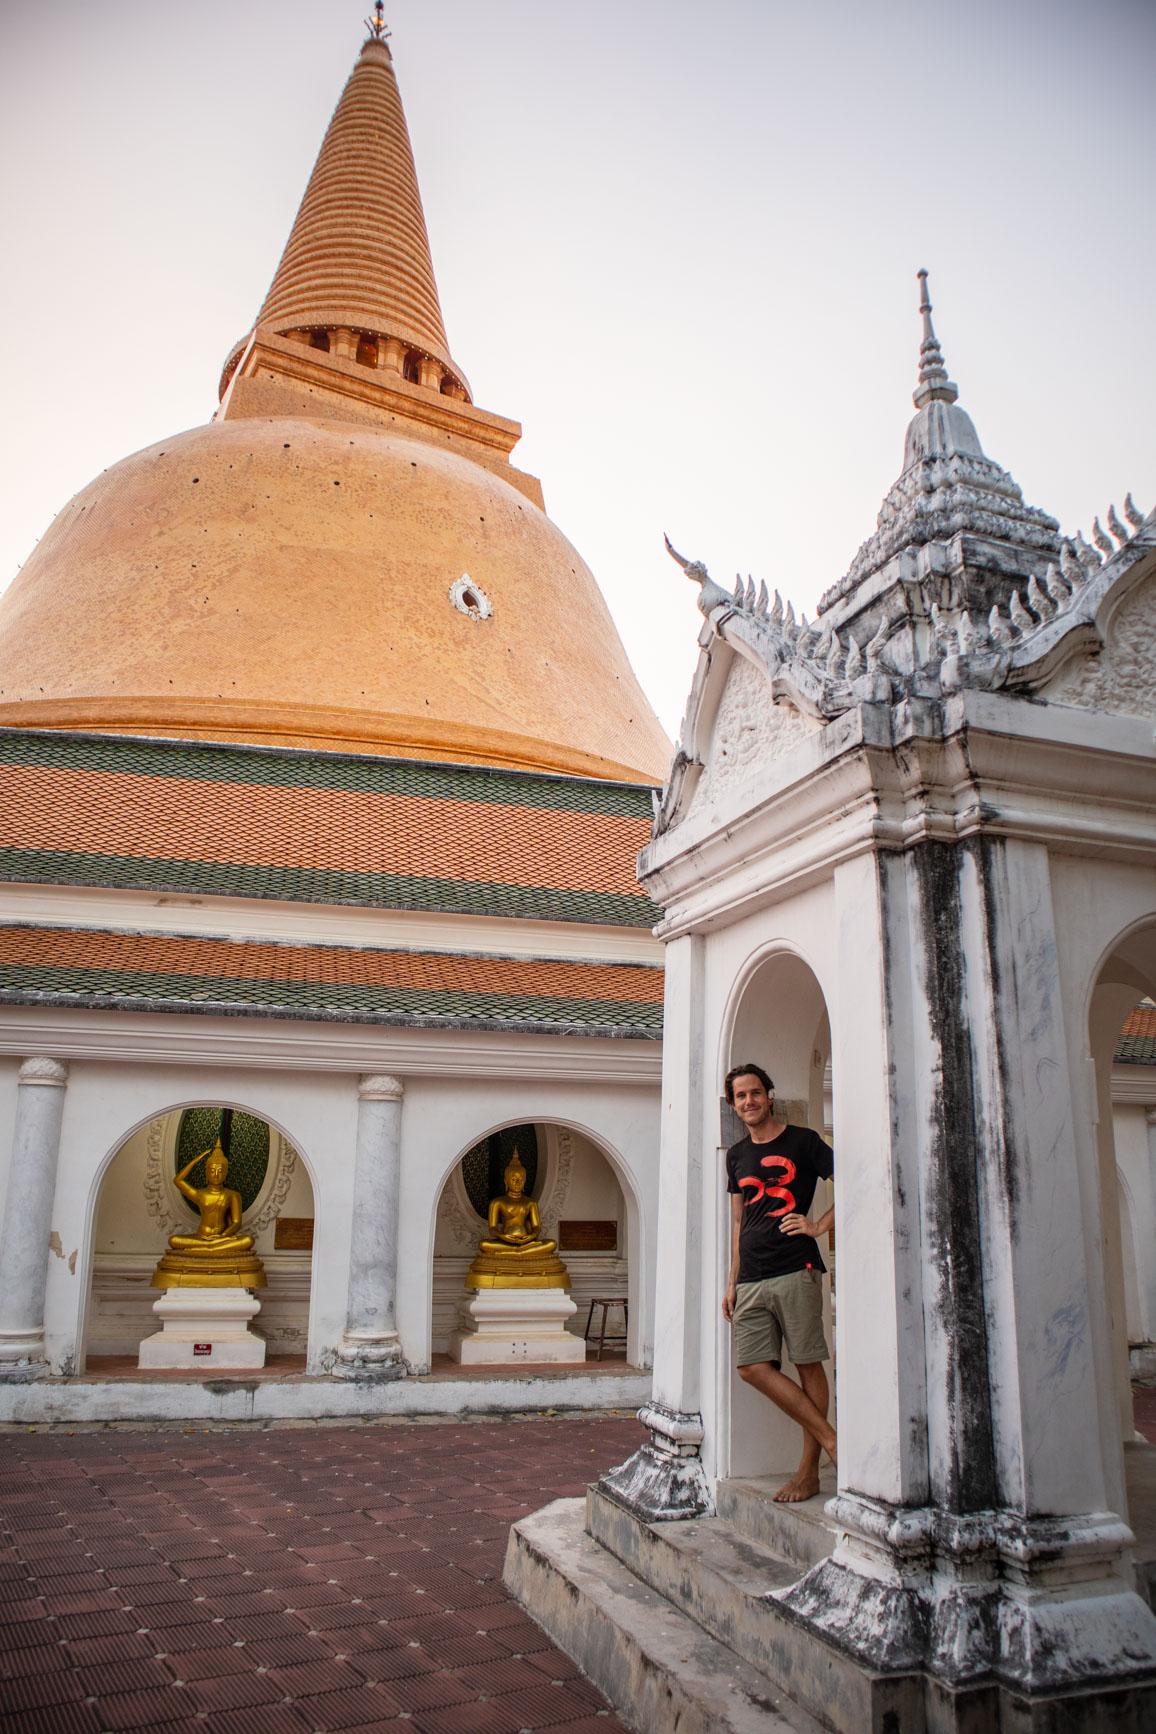 https://bubo.sk/uploads/galleries/7404/tomashornak_thajsko_img_0109.jpg